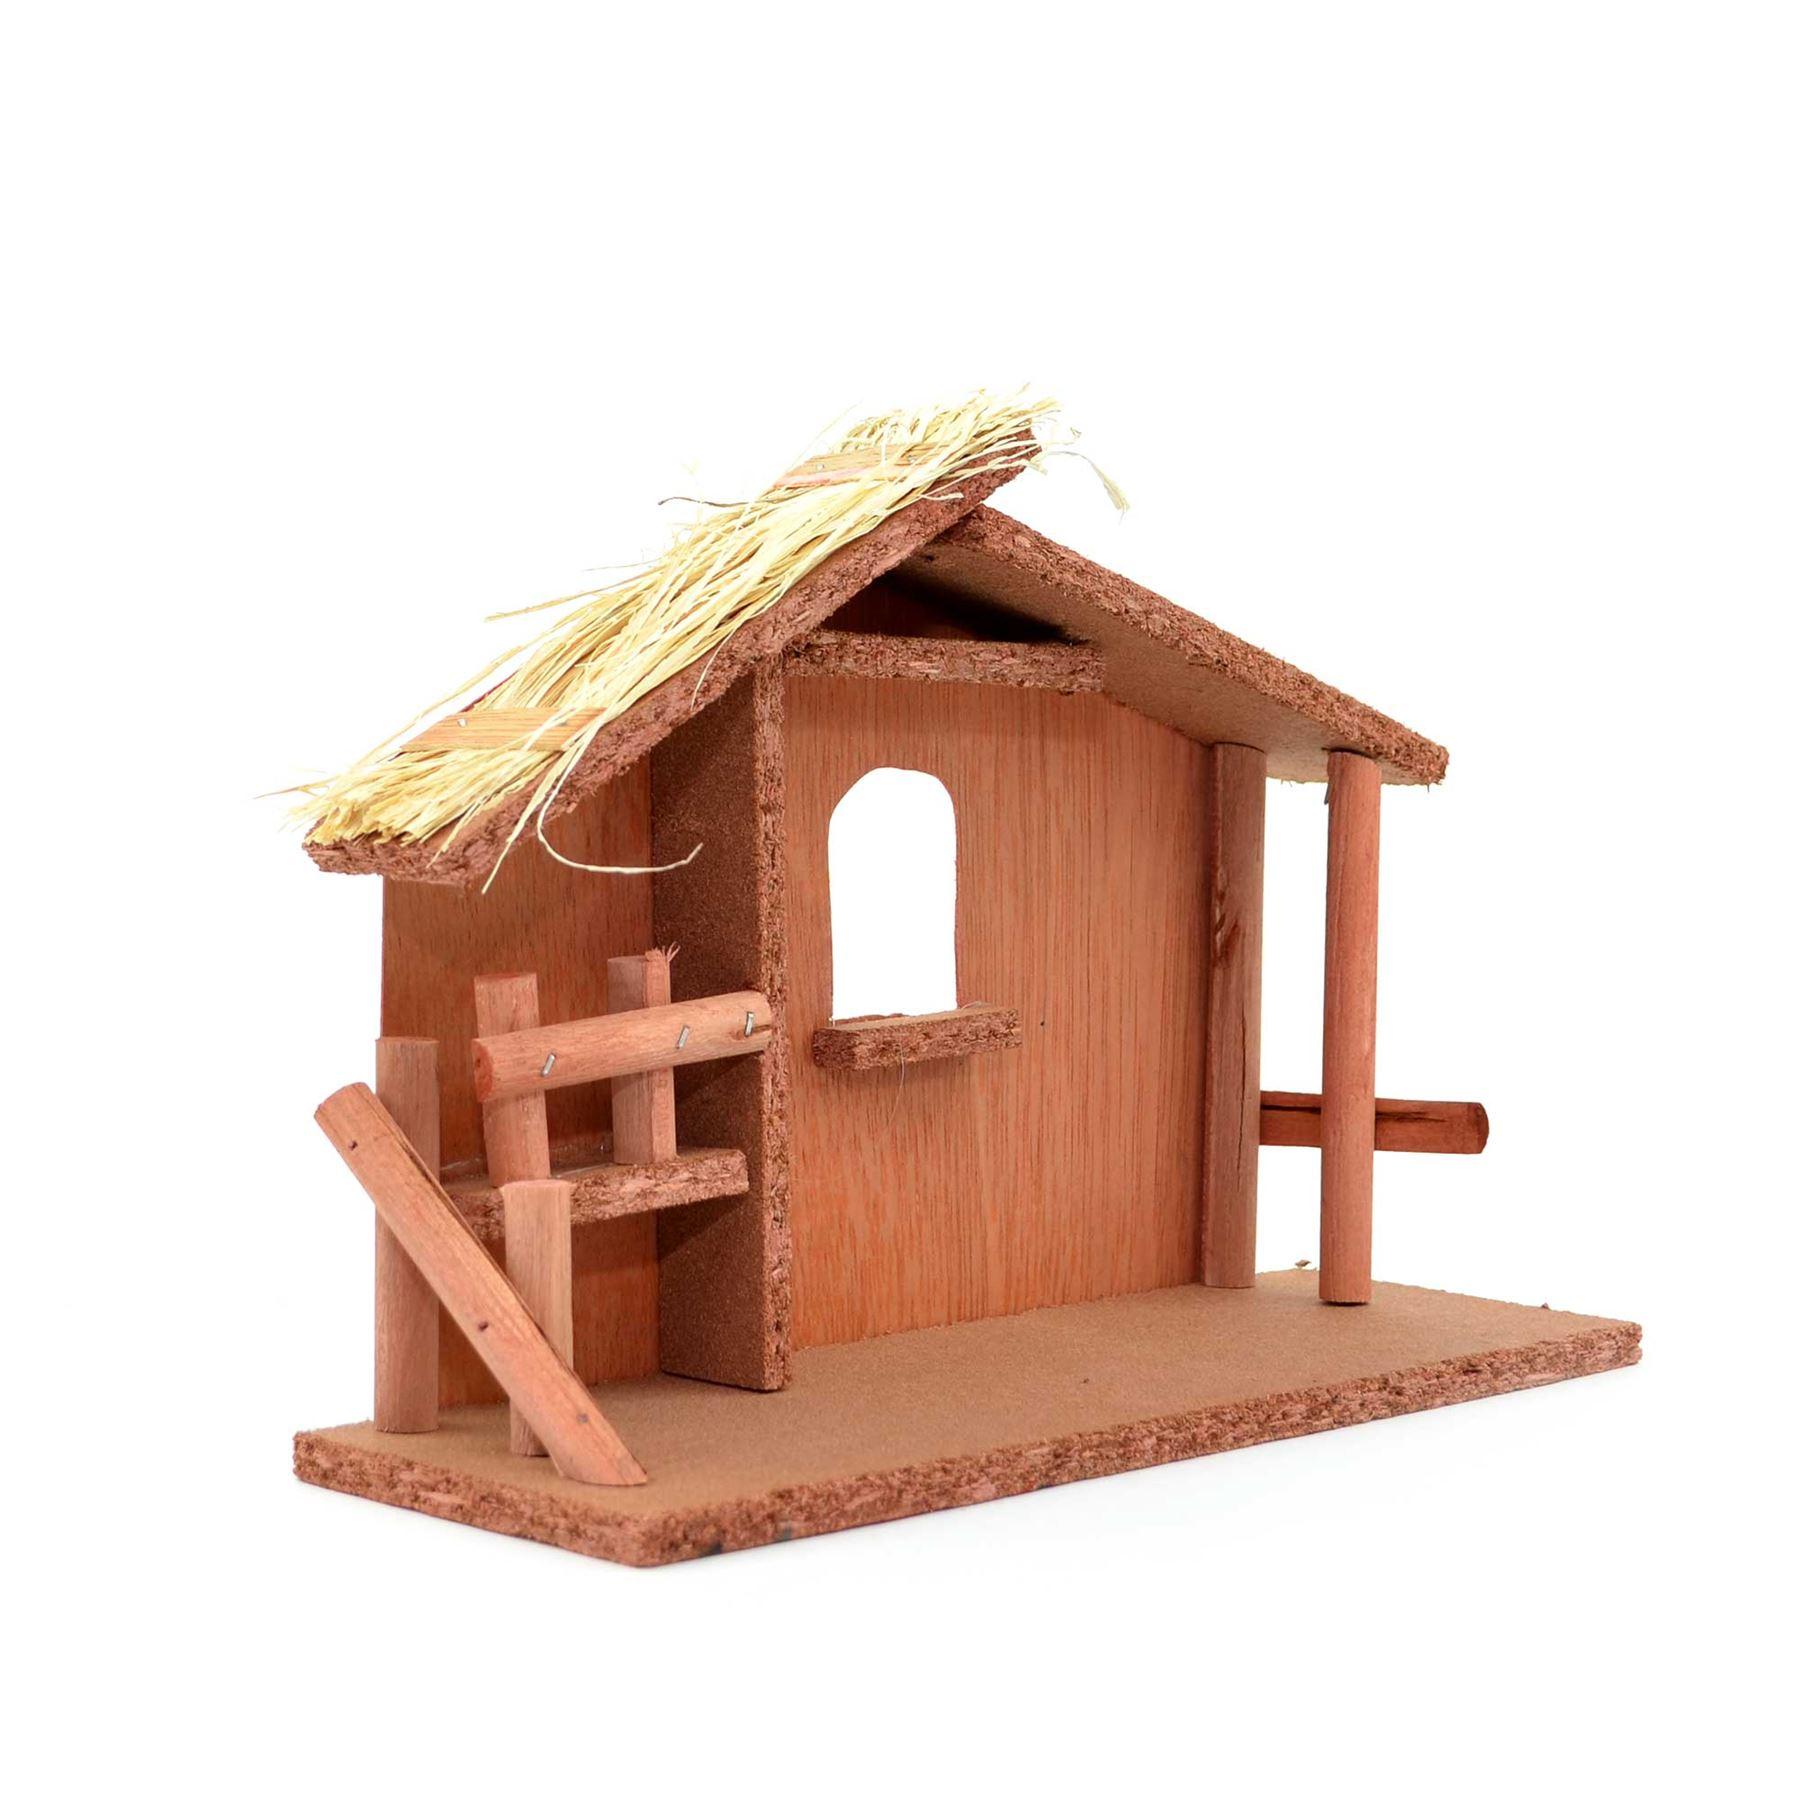 Christmas-Traditional-Nativity-Scene-Figurines-Stable-Crib-Set-Xmas-Decorations thumbnail 13